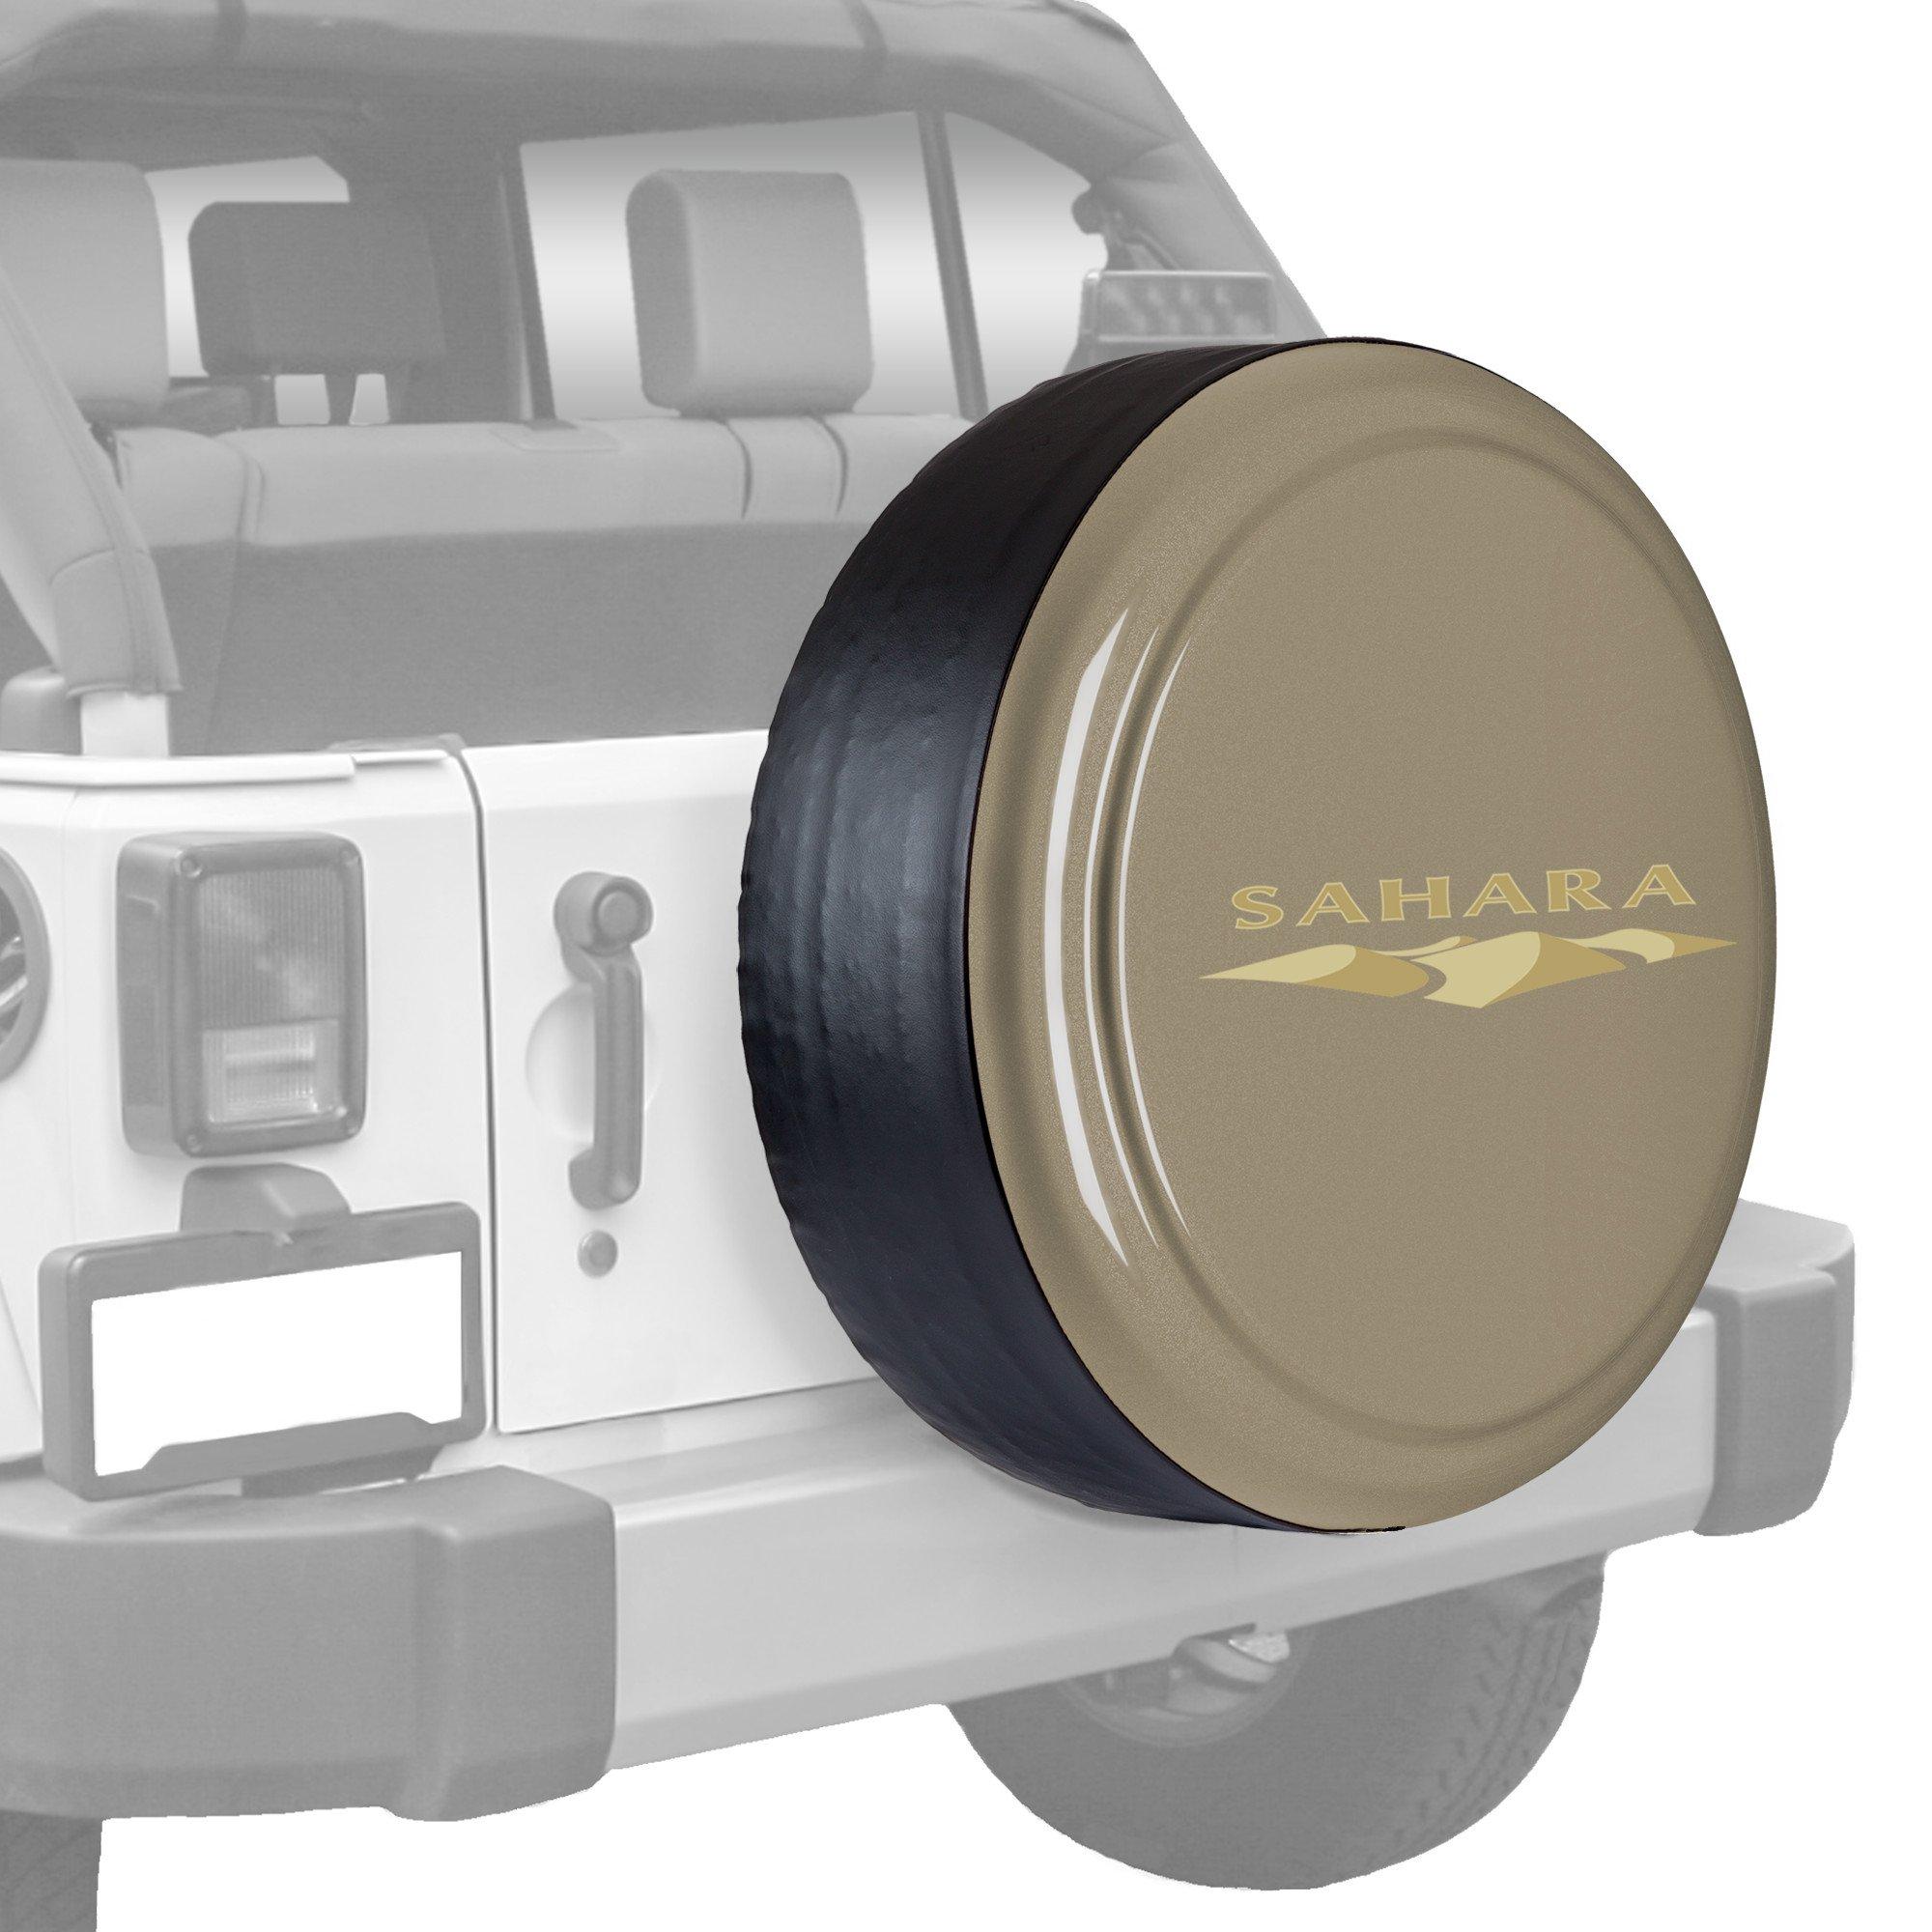 Jeep Wrangler Sahara (JK) - 32'' Color Matched Rigid Tire Cover (Plastic Face & Vinyl Band) - Gobi